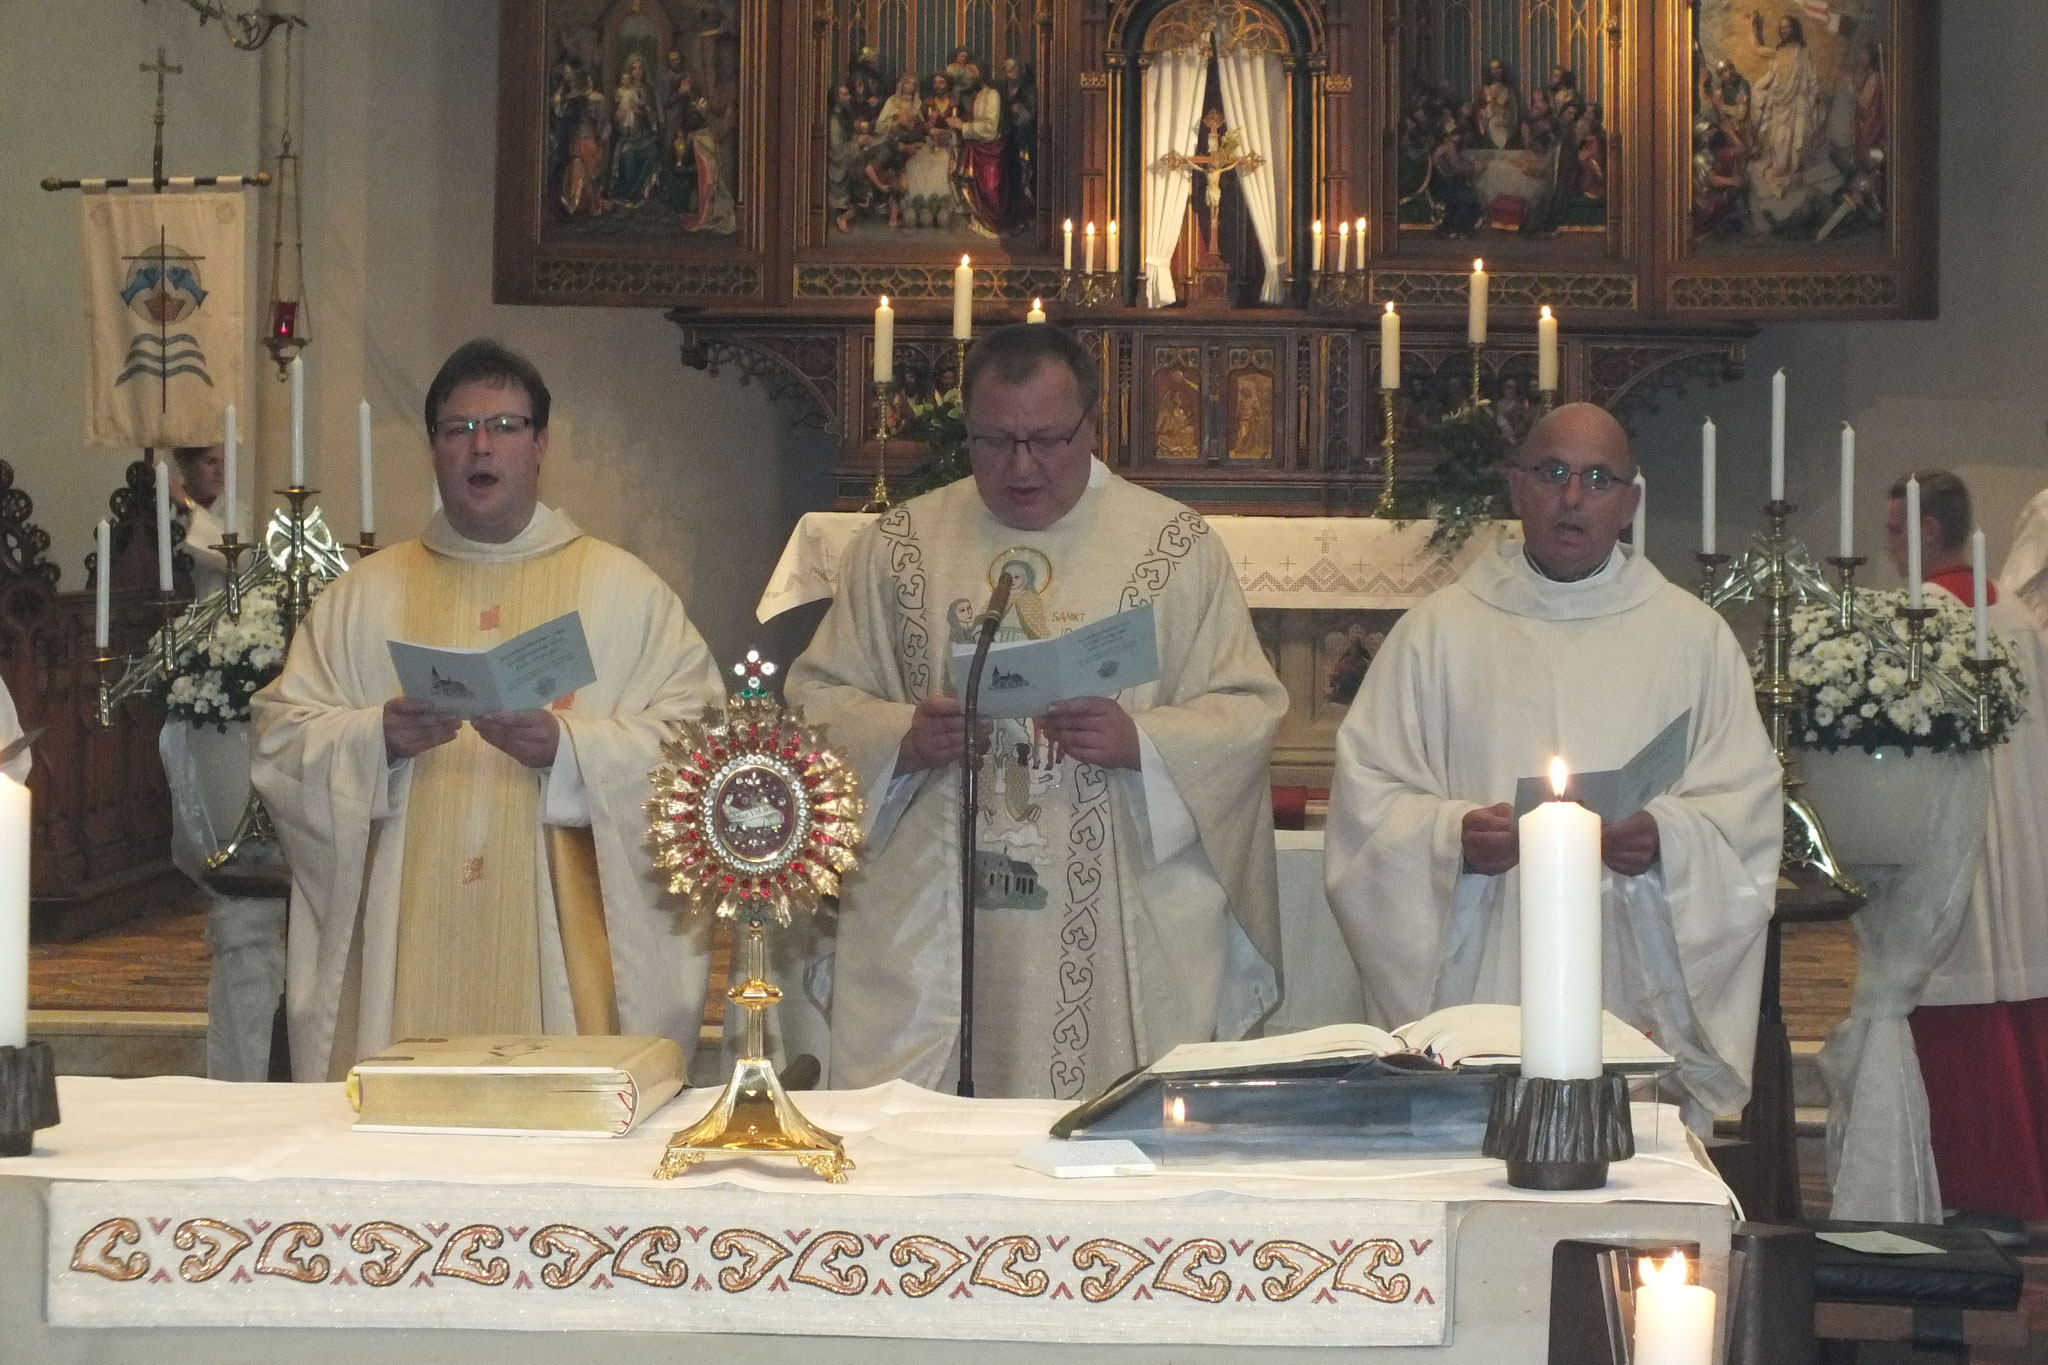 Zelebrant und Prediger: Pfarrer Veit Scapan, St. Petri Bautzen